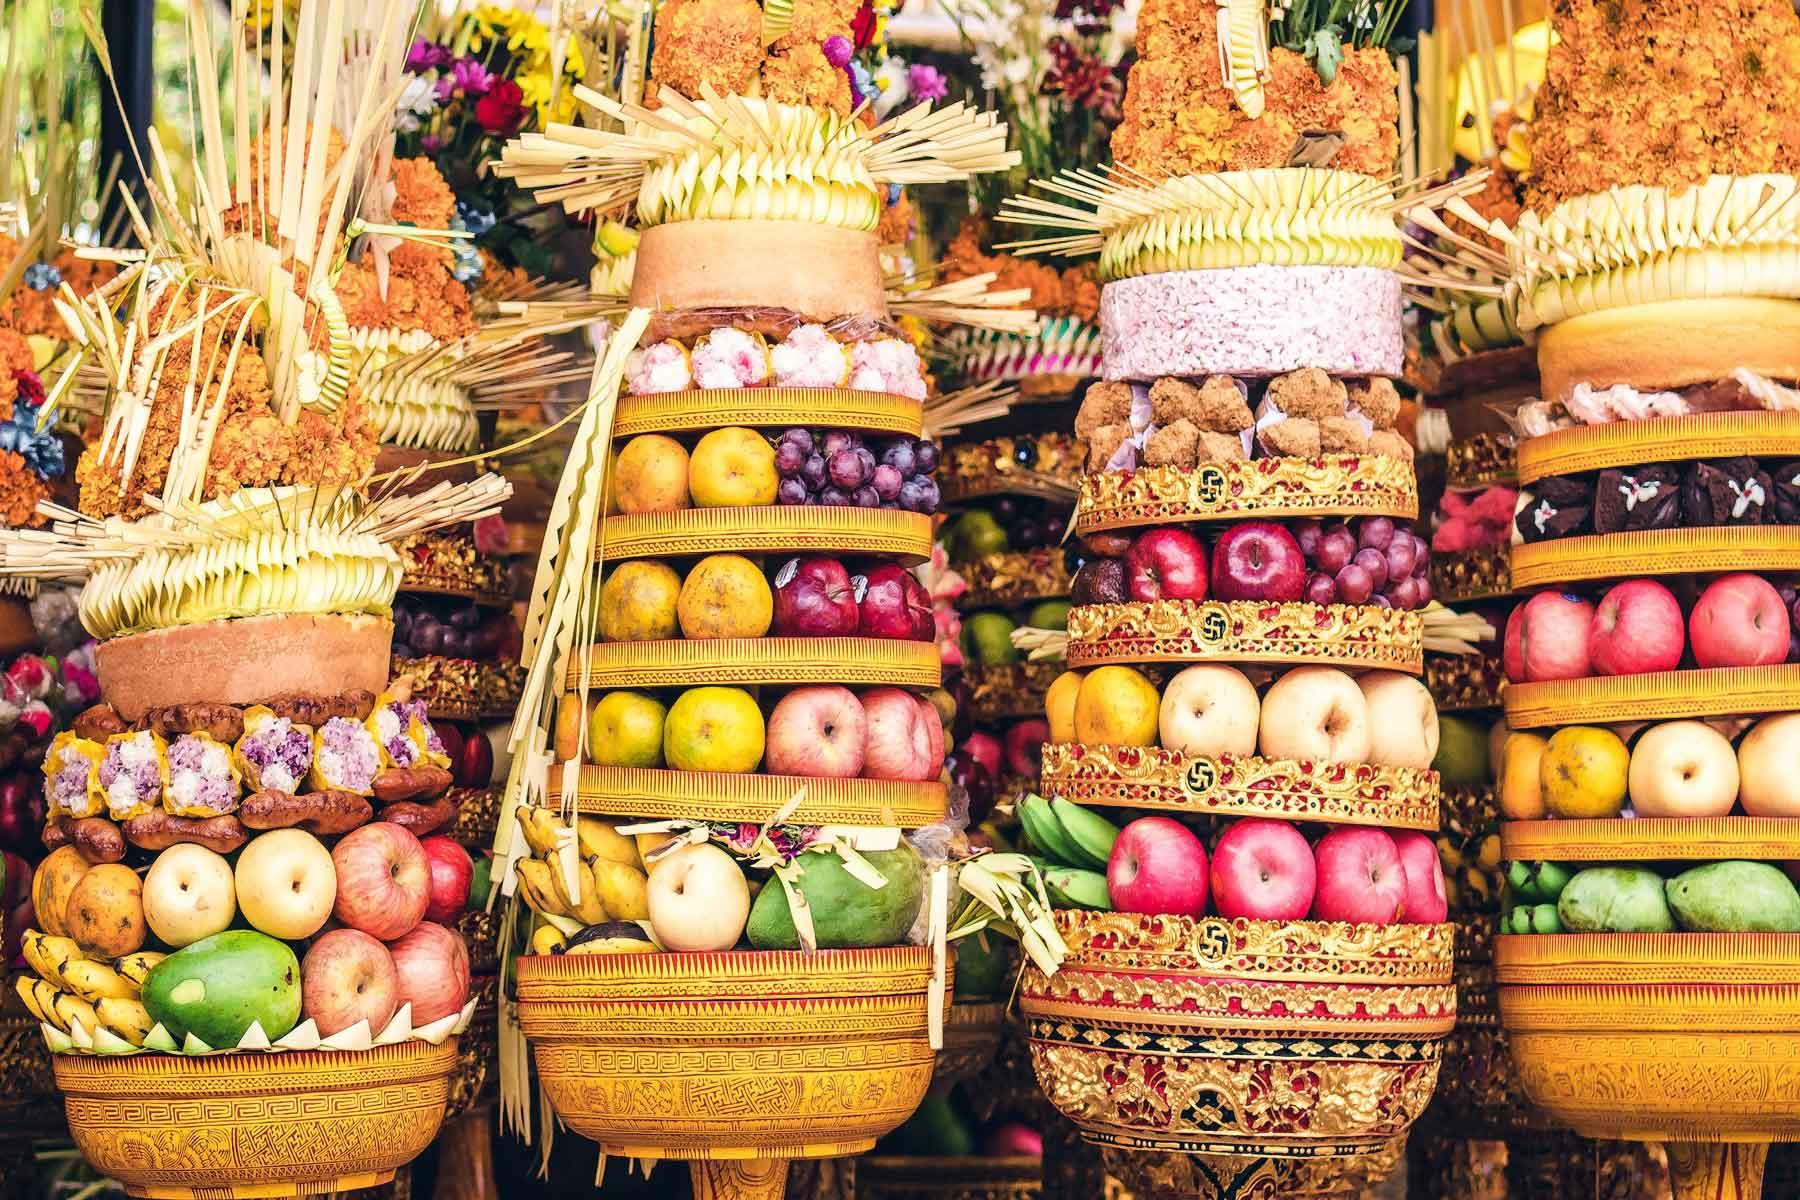 Resor-till-Bali-med-Nygren-&-Lind-Resebyrå---frukt